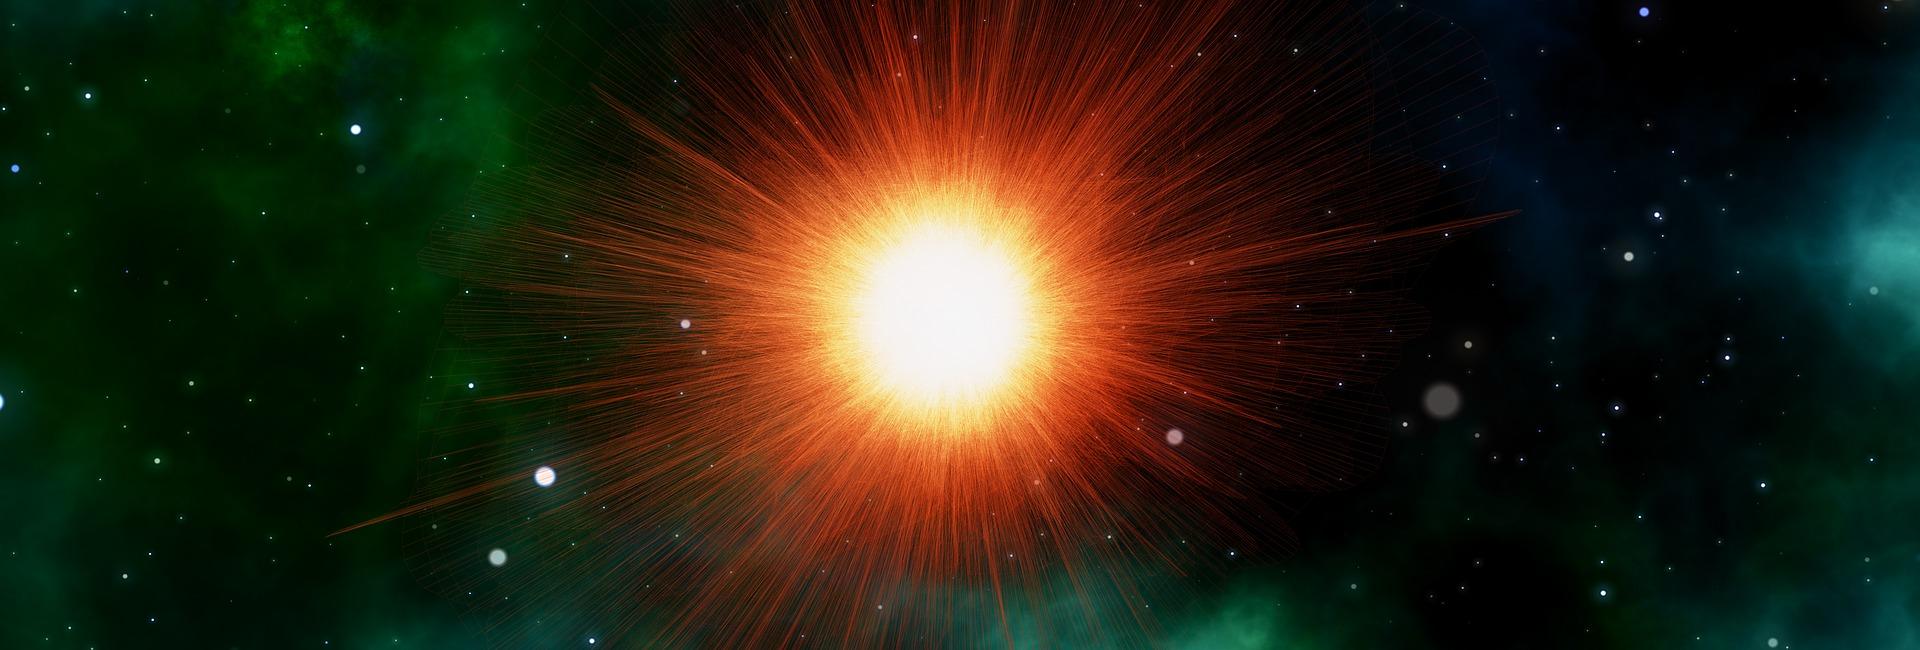 universe-2151332_1920